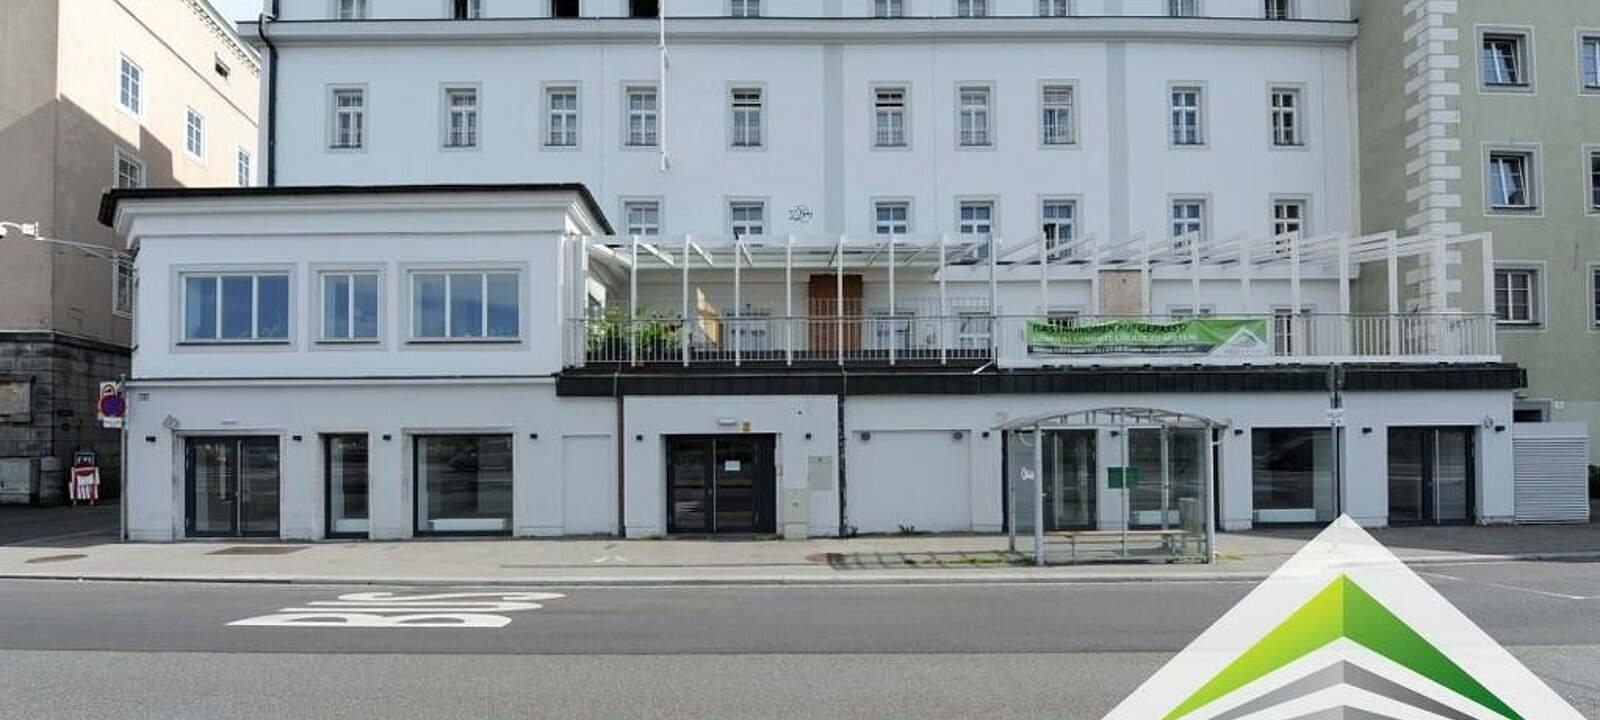 Hausfront Obere Donaulände